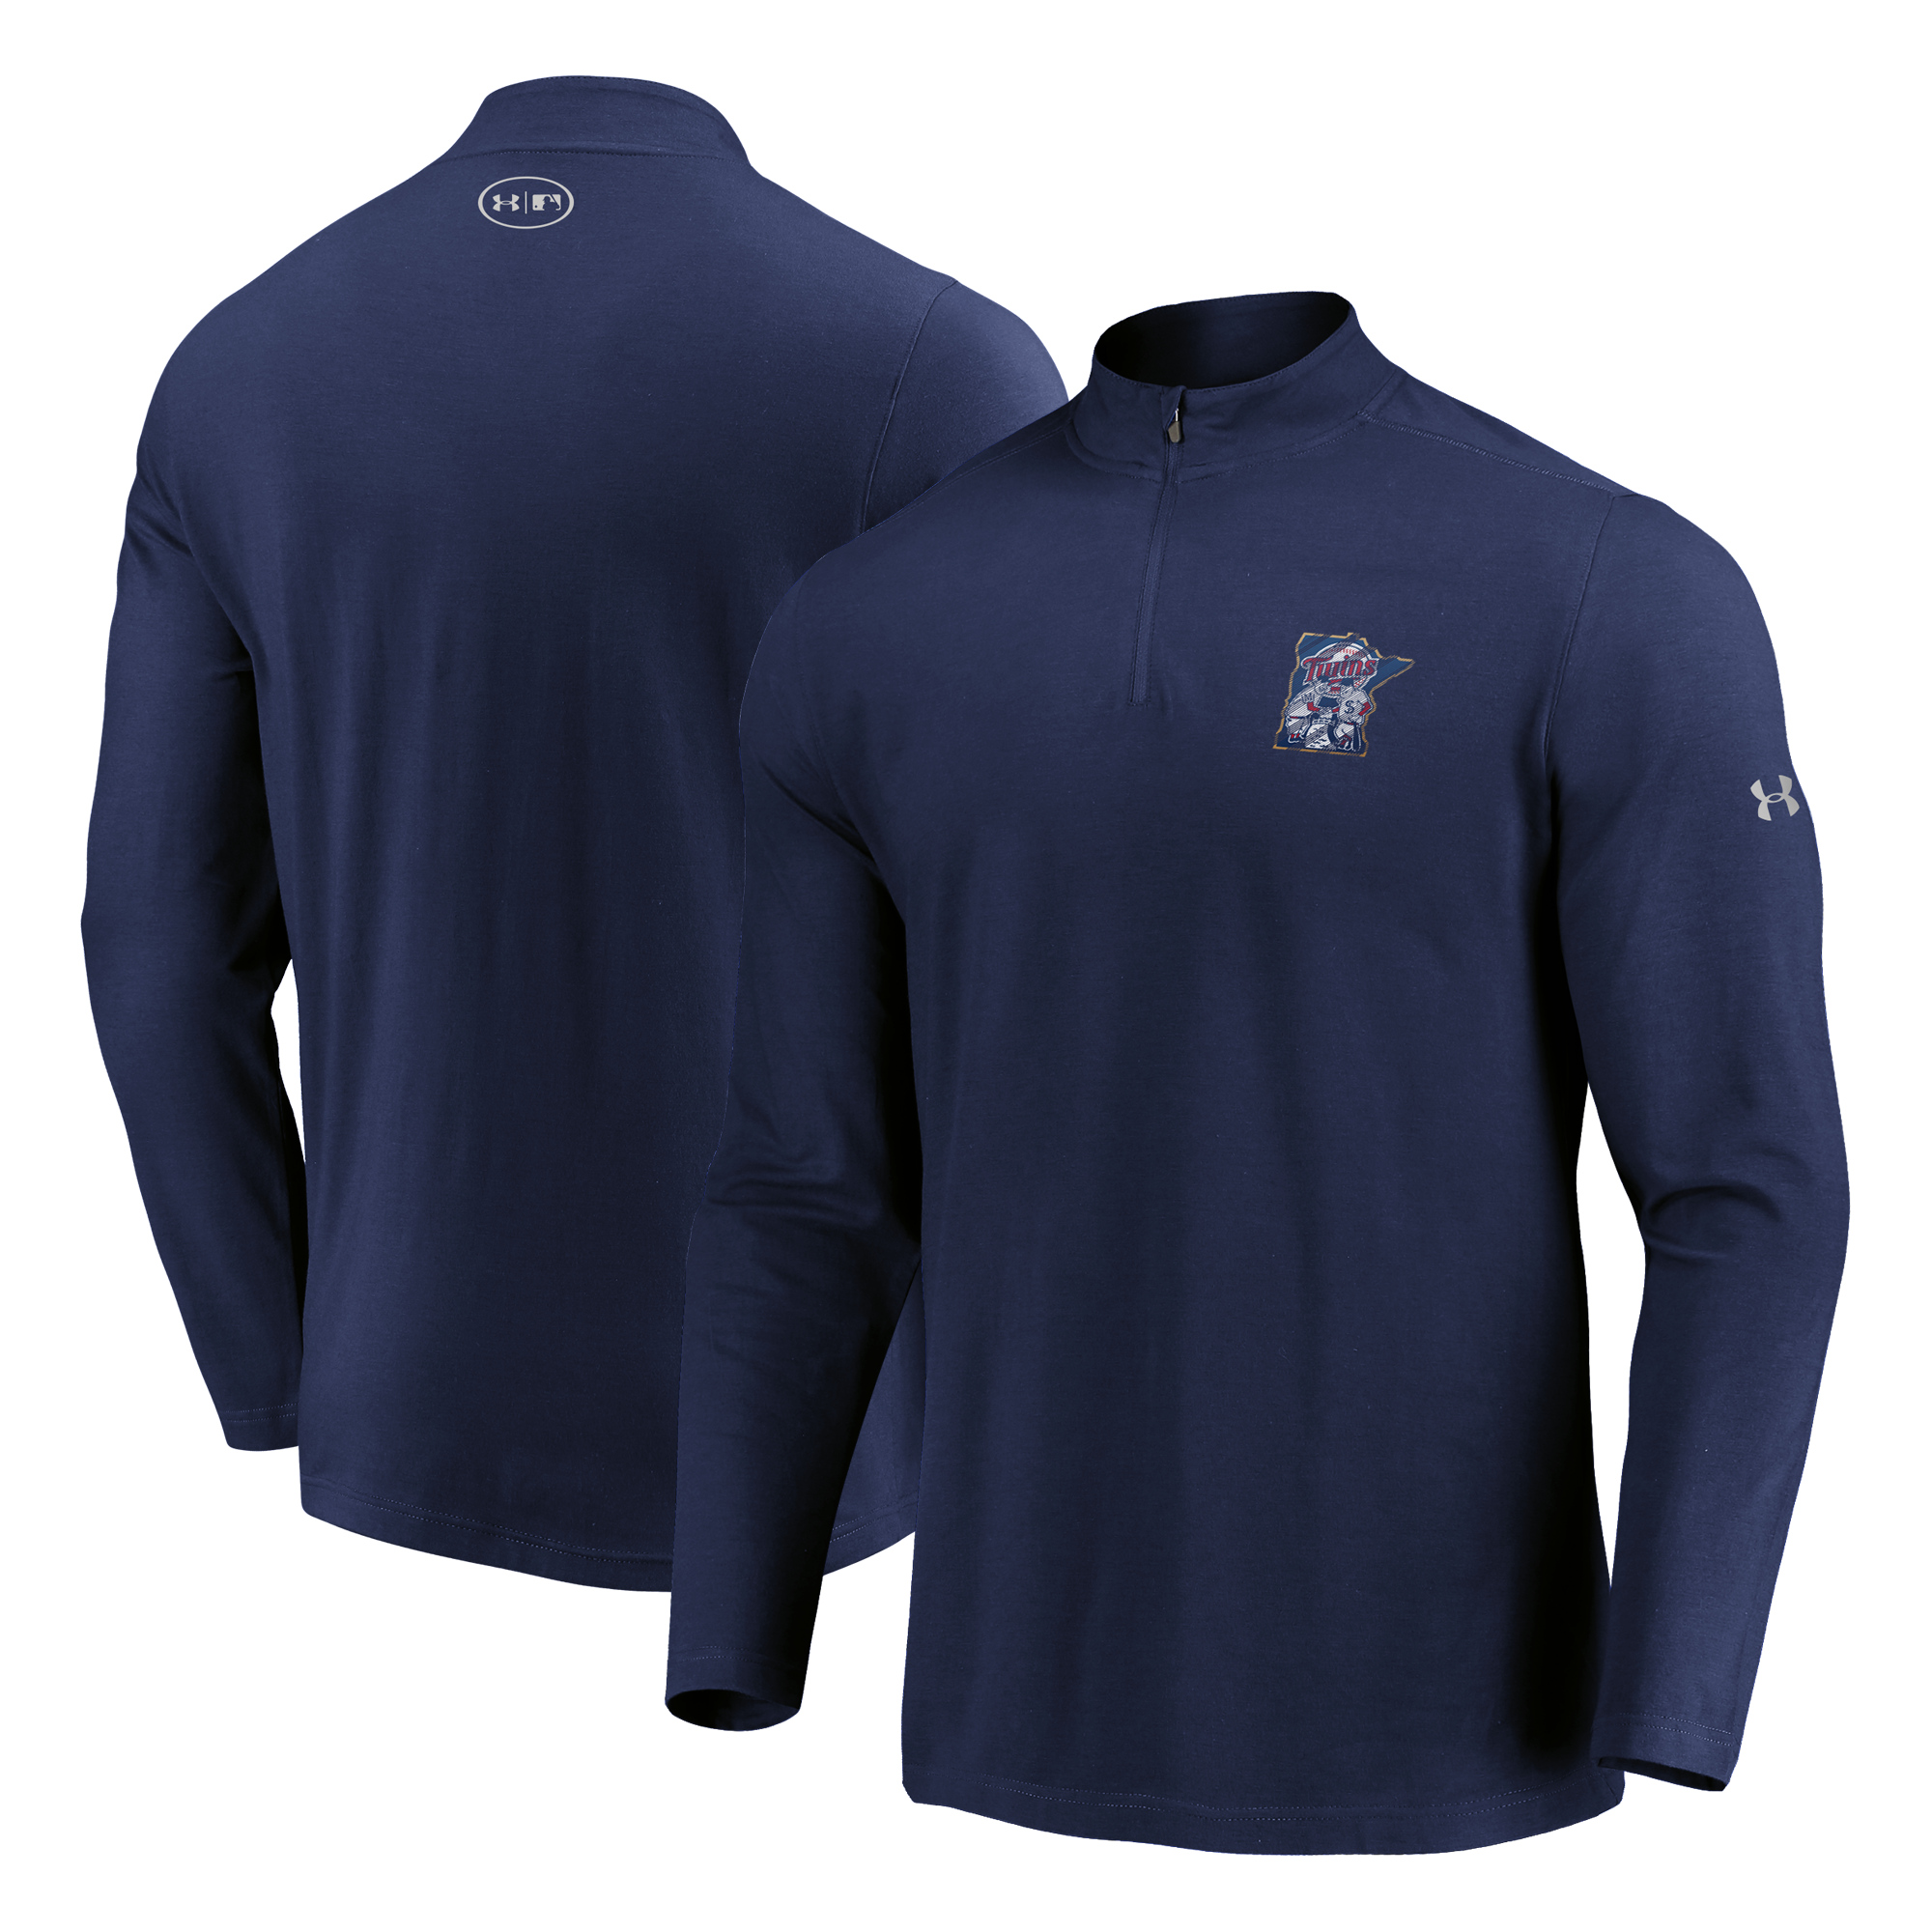 Minnesota Twins Under Armour Passion Alternate Left Chest 1/4-Zip Jacket - Navy